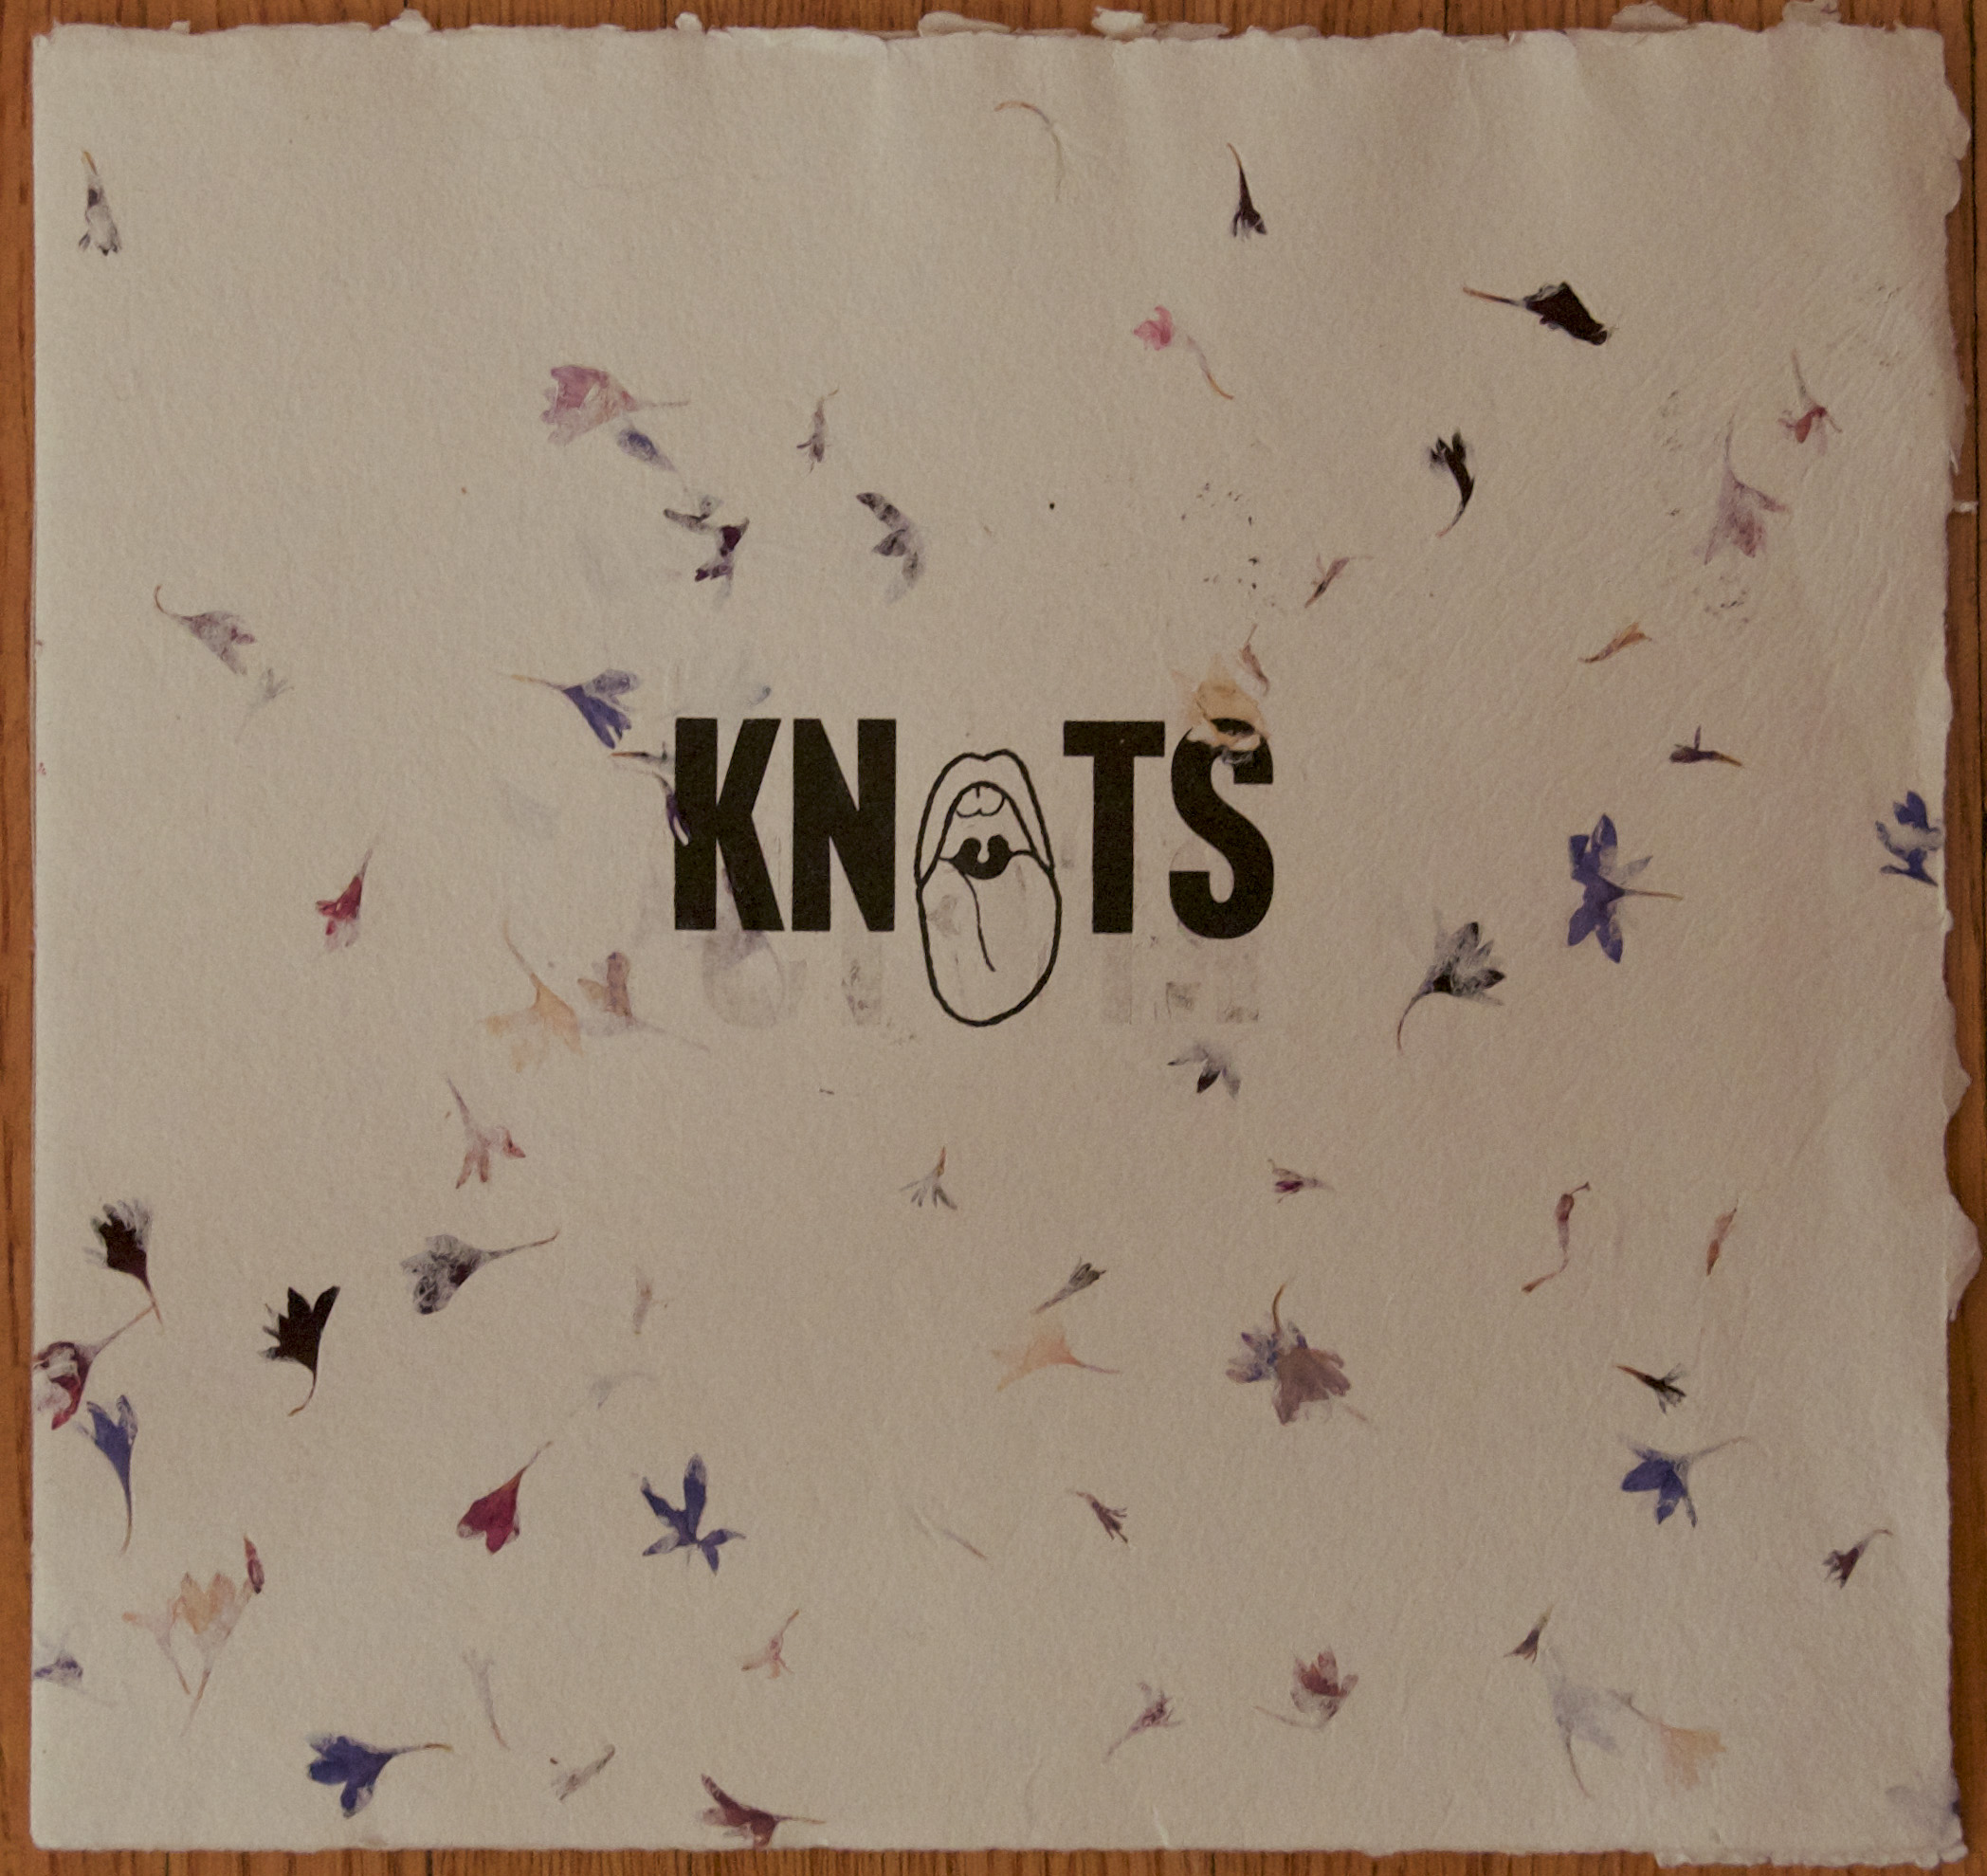 knots - 1.jpg